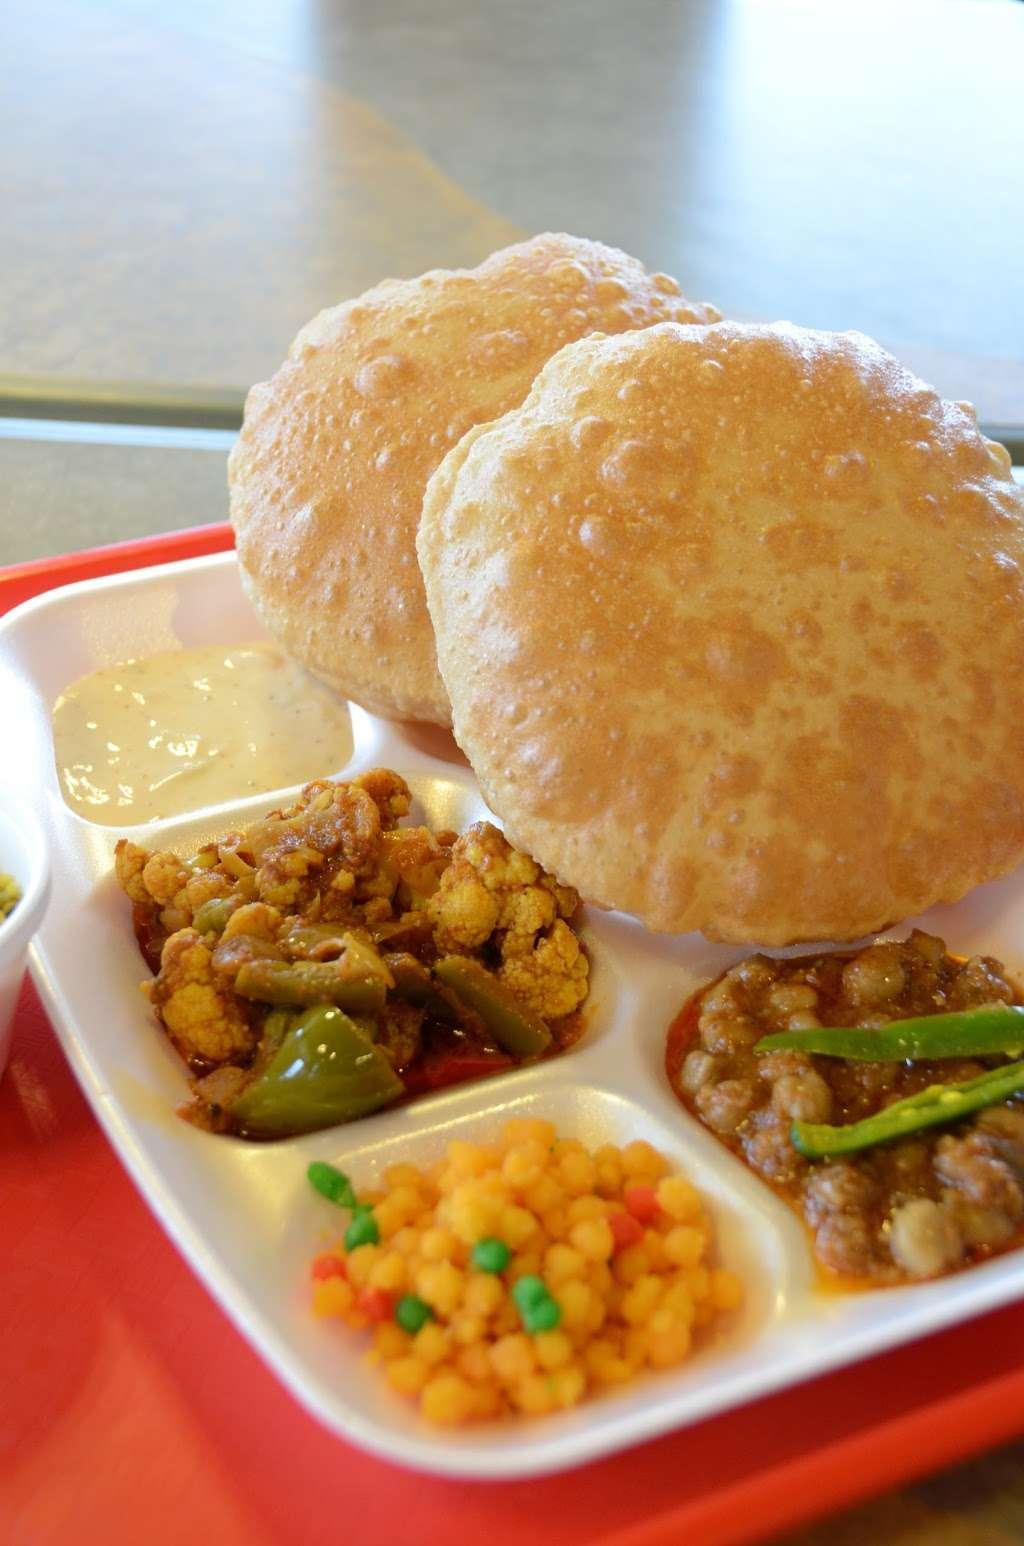 Chataka Masti Indian Grill - restaurant  | Photo 4 of 10 | Address: 888 S. Rt 59 #108, Naperville, IL 60540, USA | Phone: (630) 922-5880